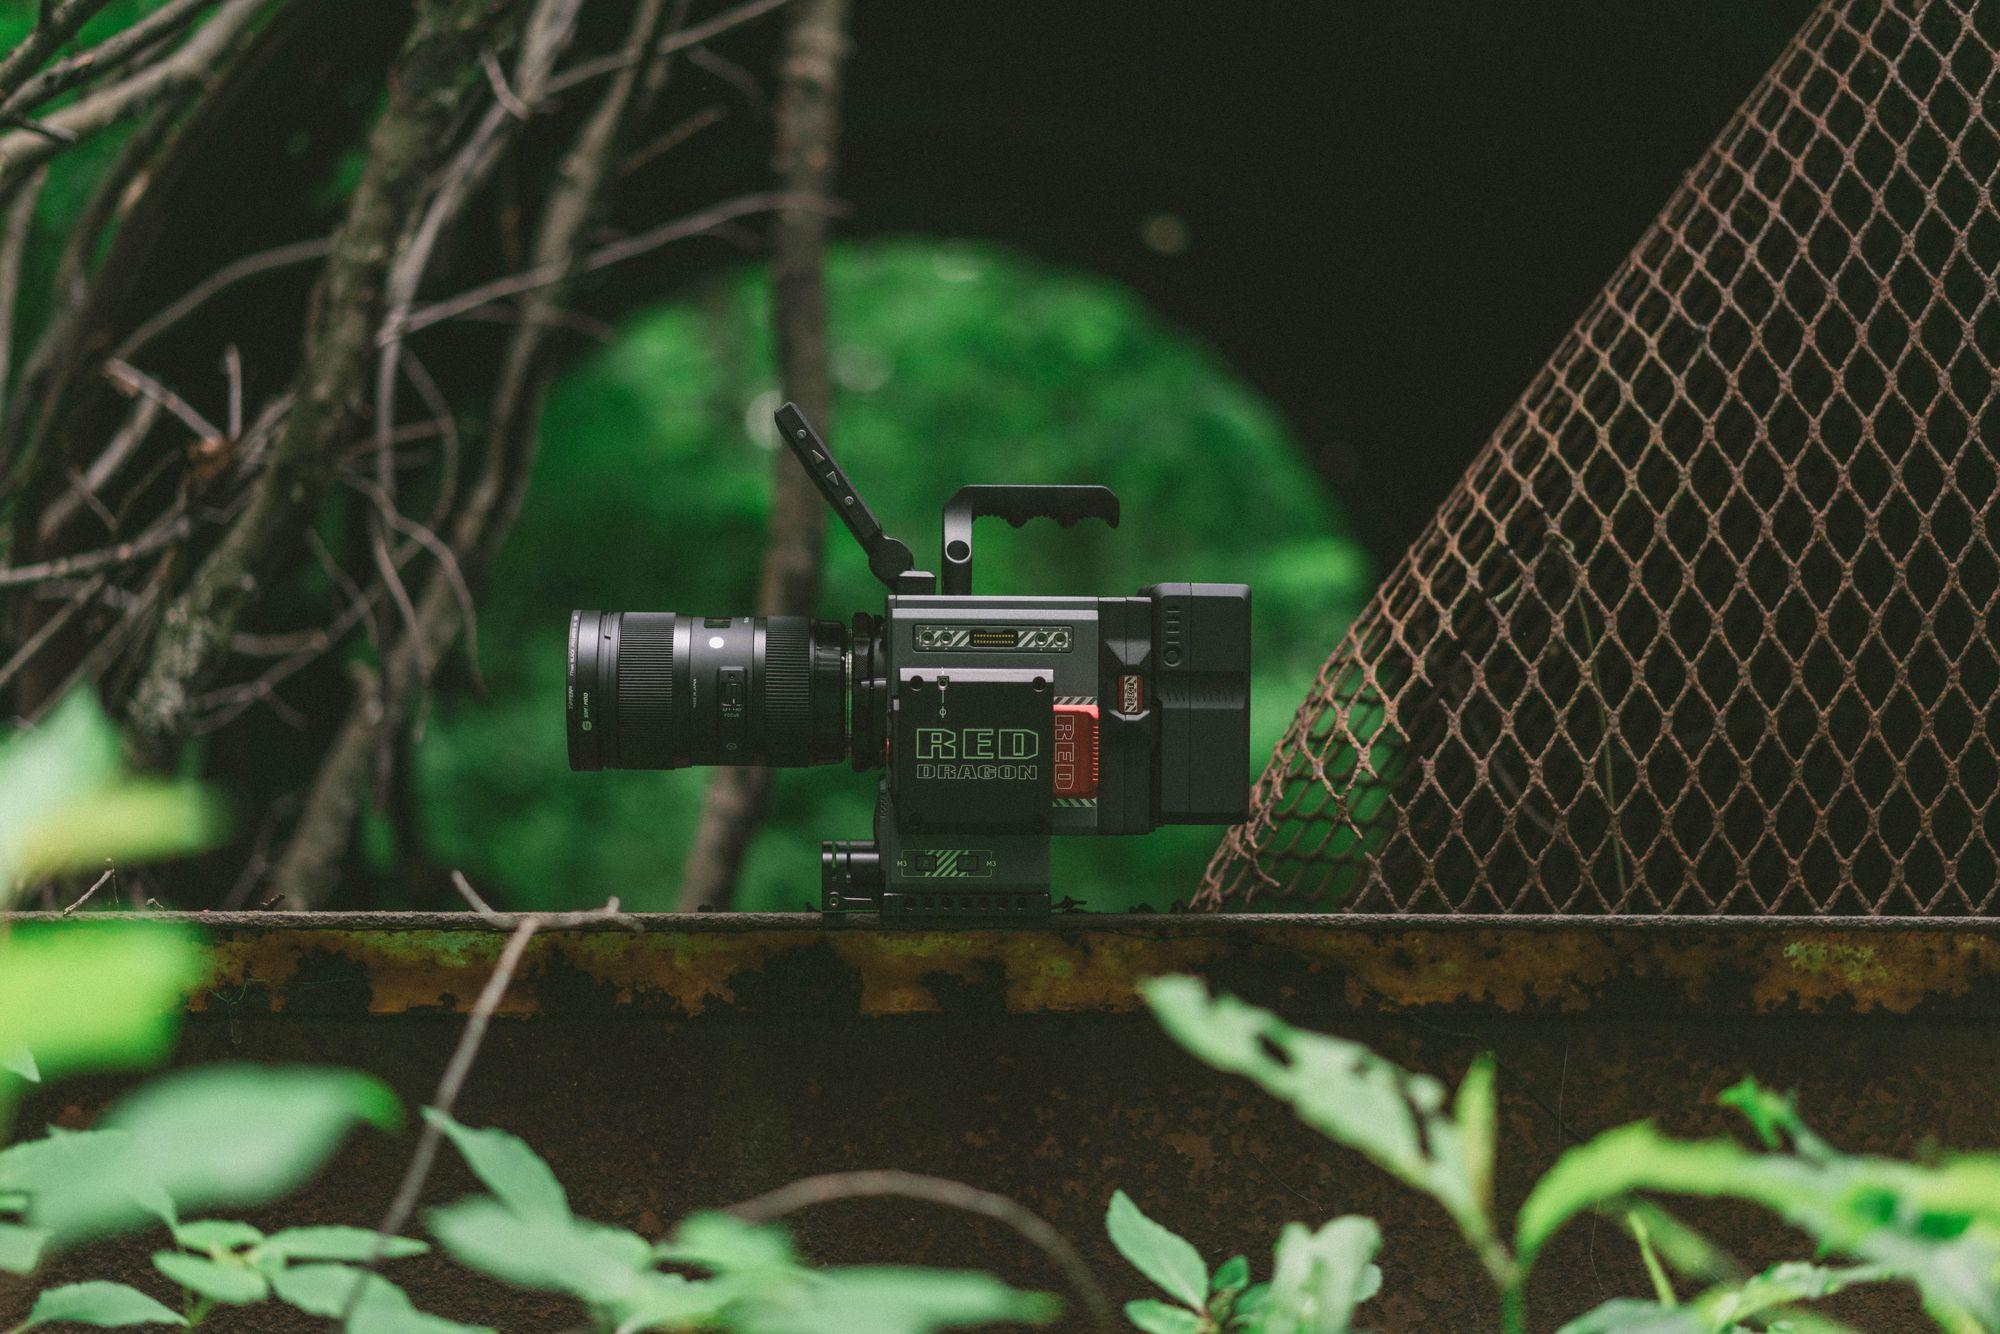 camera outside near underpass